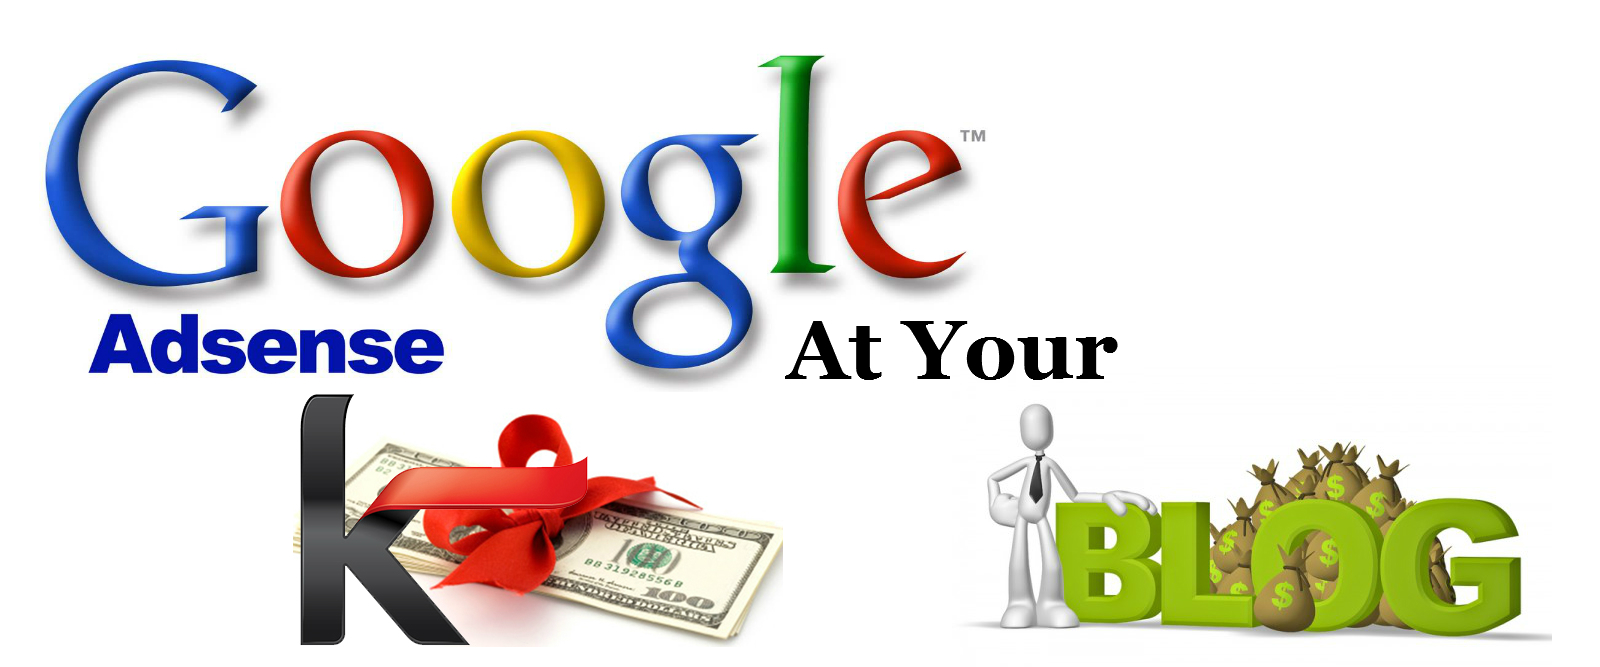 Google adsense earning boost